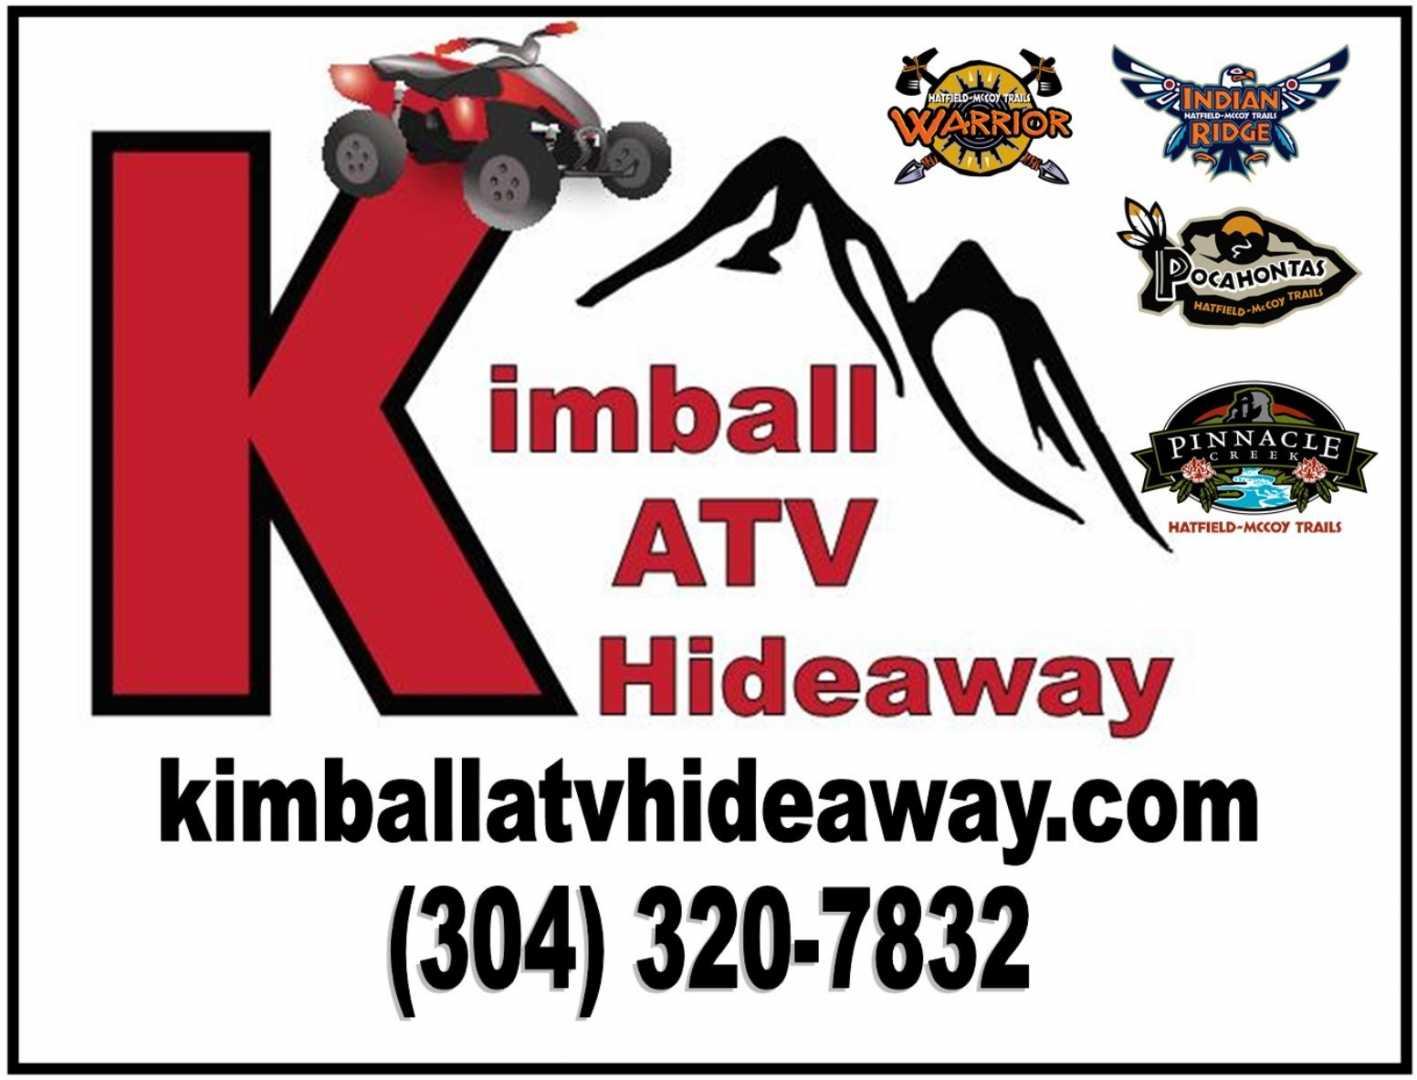 Kimball ATV Hideaway